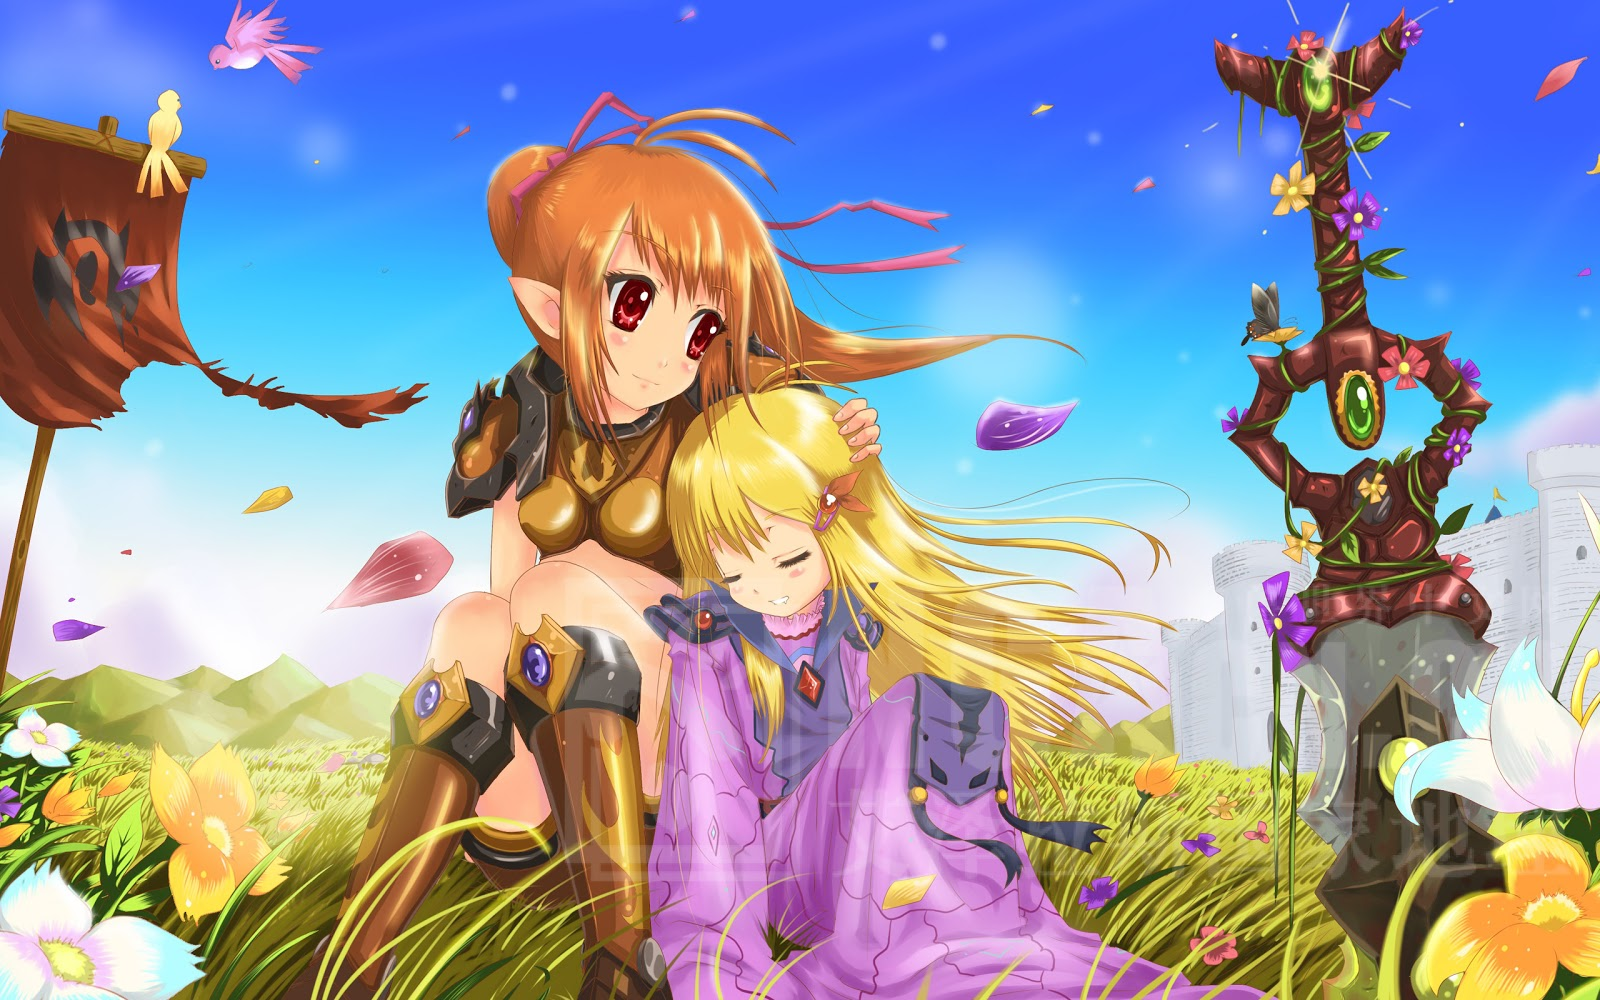 http://3.bp.blogspot.com/-4YwA_Ox1ipM/UI0lTcIYh6I/AAAAAAAAAE4/9LjG966Gims/s1600/Girls+Anime+Wallpaper.jpg